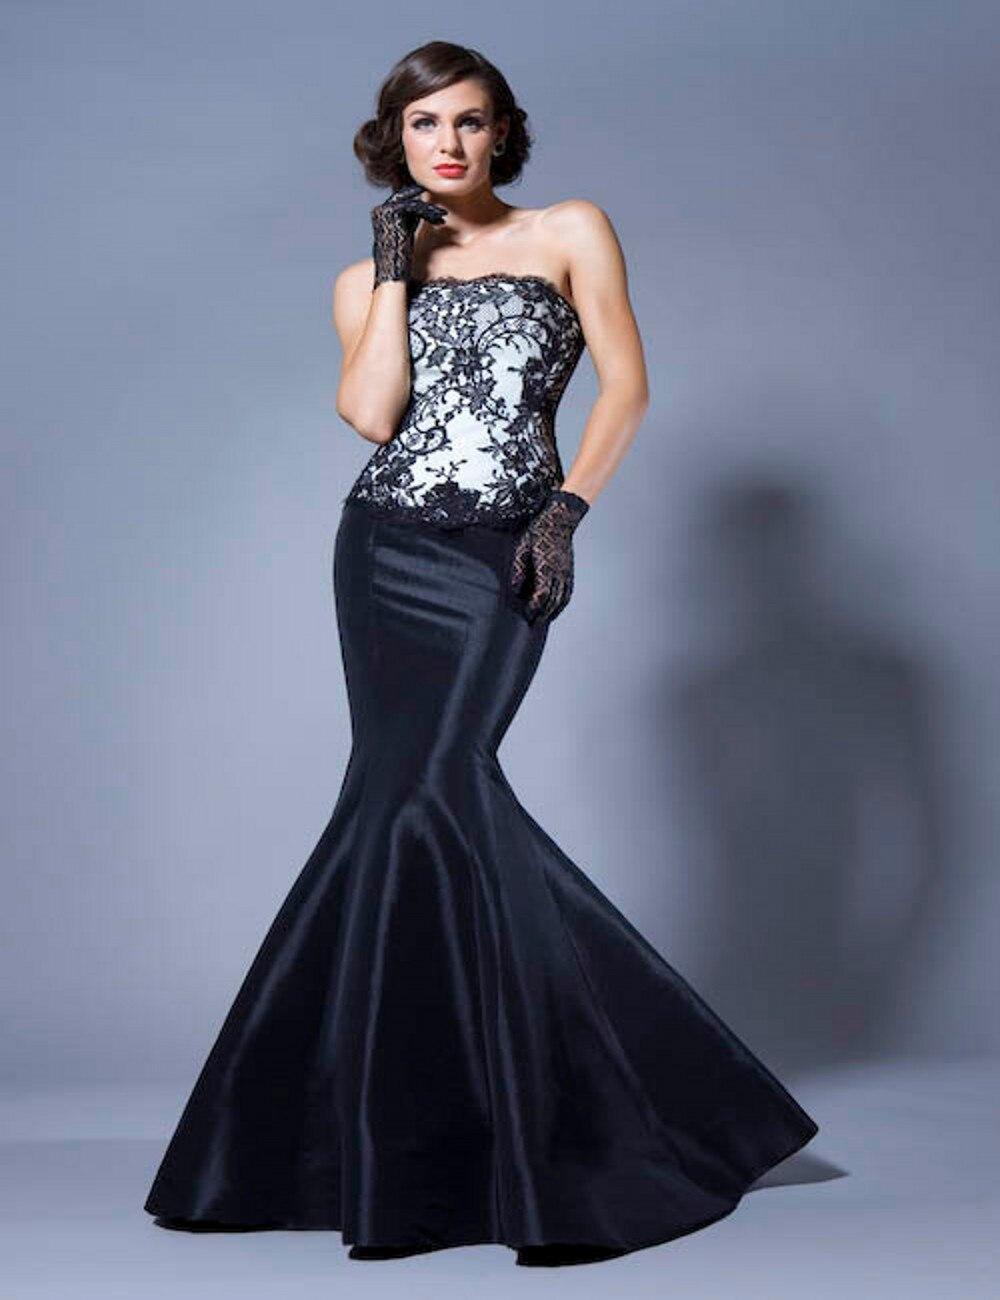 Black dress under white graduation gown - Vestido De Fiesta 2016 New Black Lace Mermaid Prom Dress Long Appliques Strapless Graduation Dresses Zipper Back Black And White